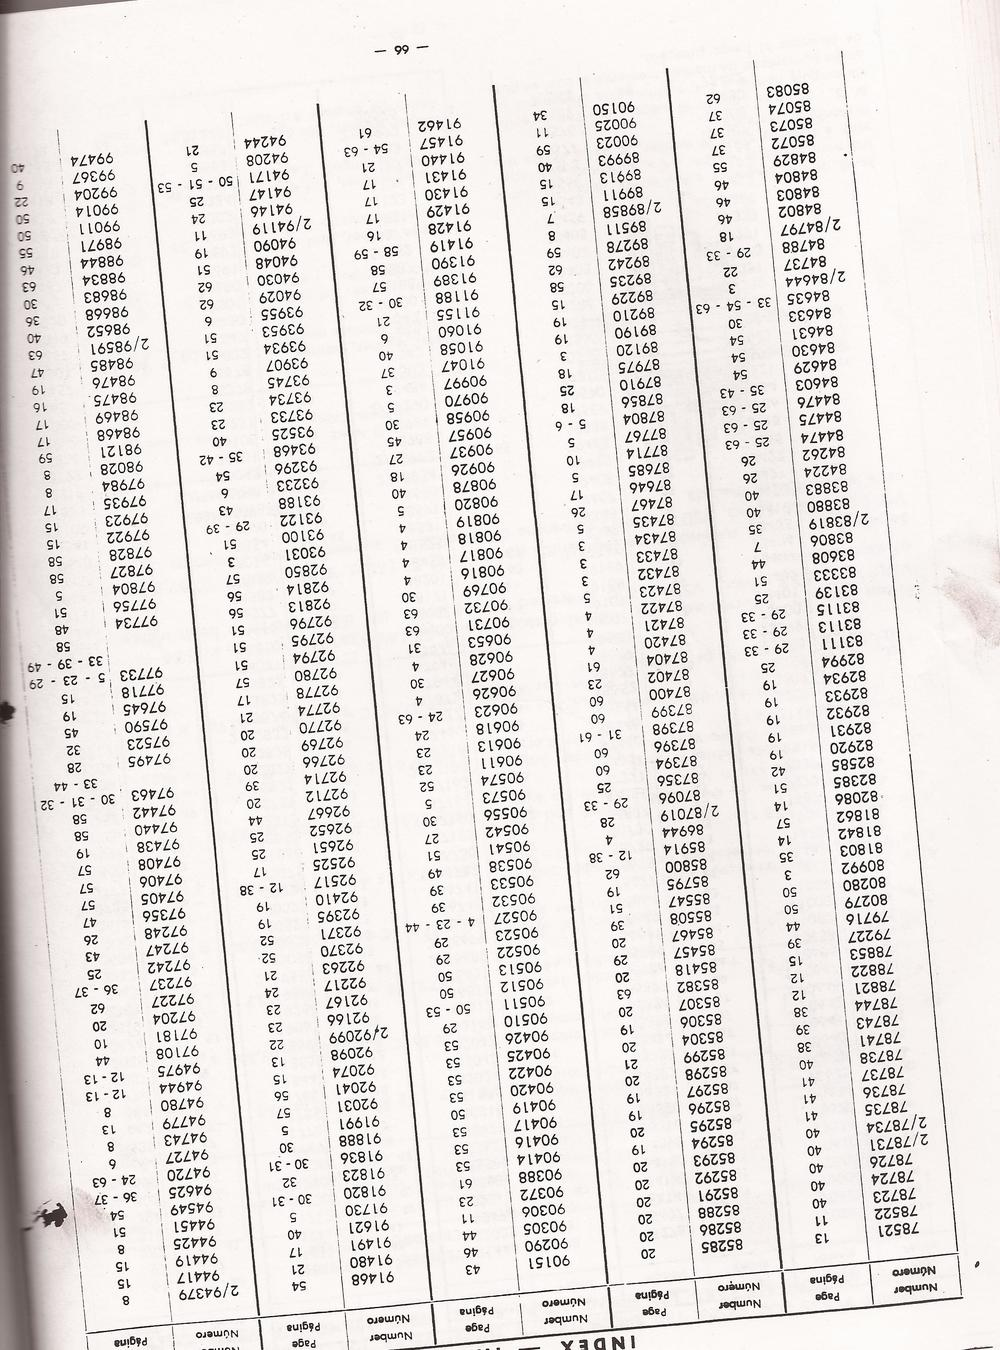 02-25-2013 vespa manaul 75.jpg